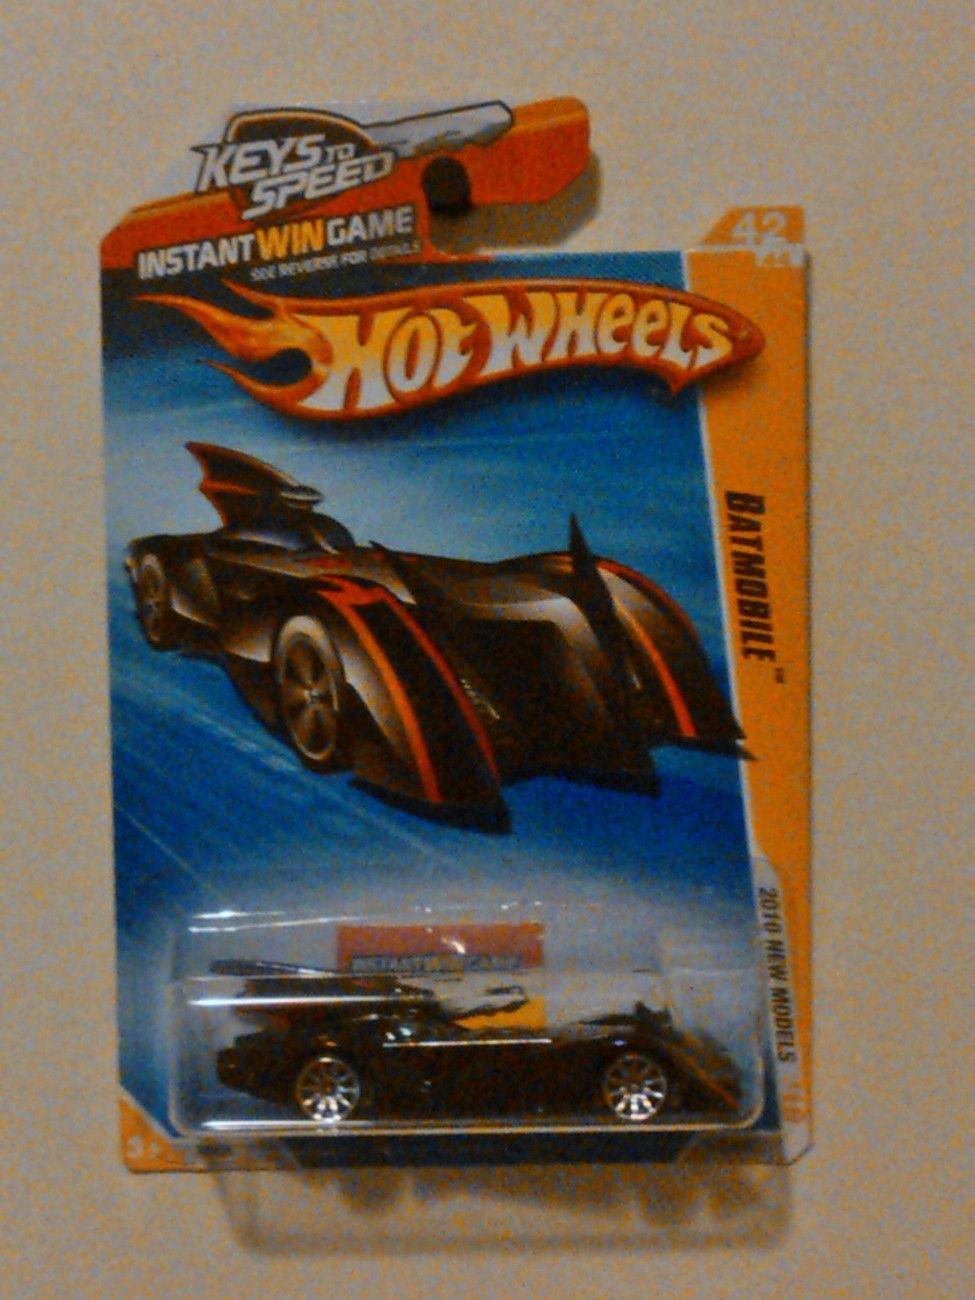 Batmobile 1 64 Scale Hot Wheels Keys To Speed 2010 New Models